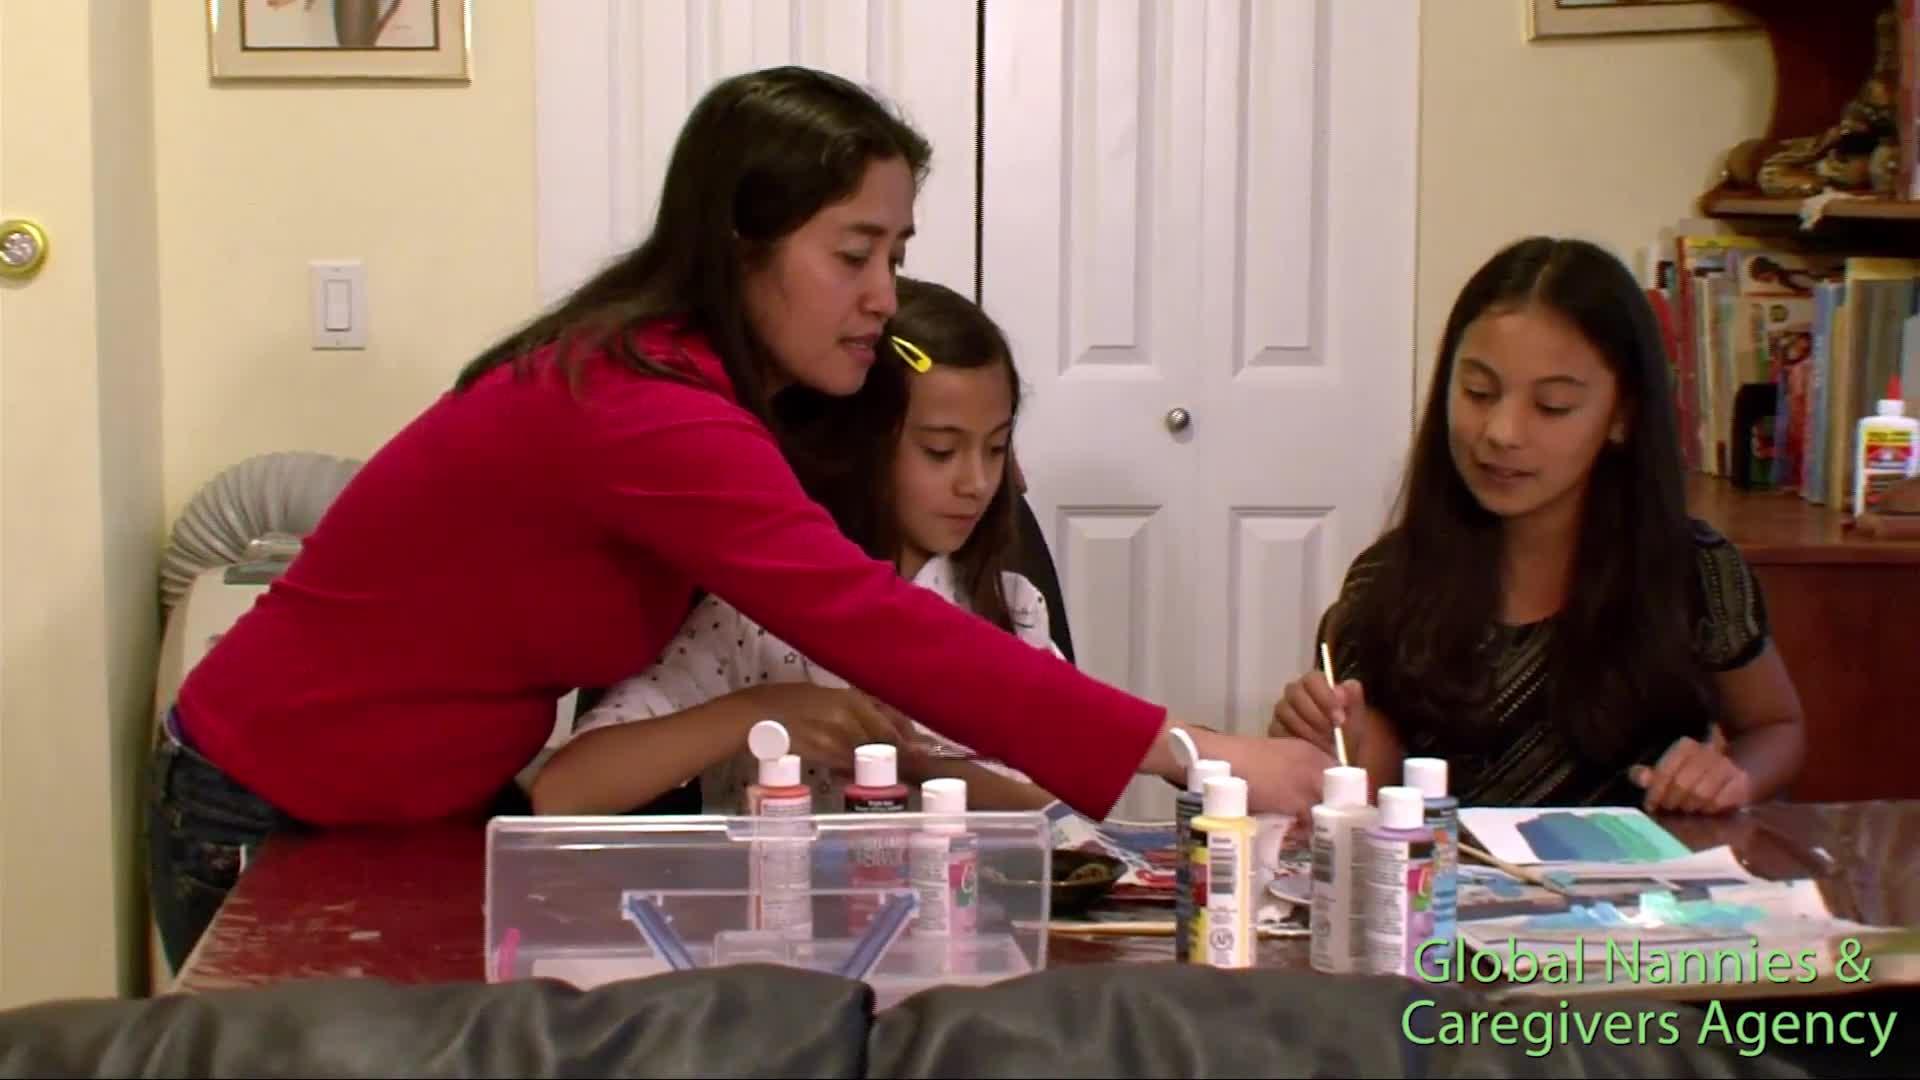 video Global Nannies & Caregivers Agency Ltd